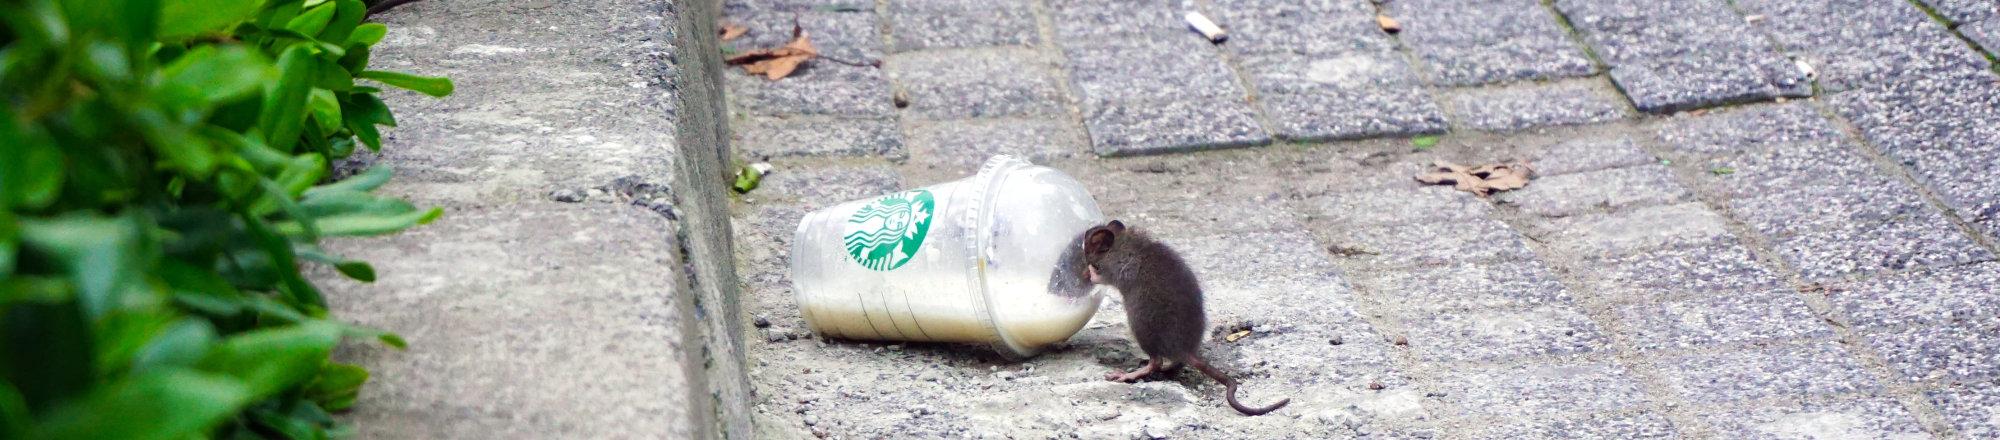 Control de ratas en Bizkaia